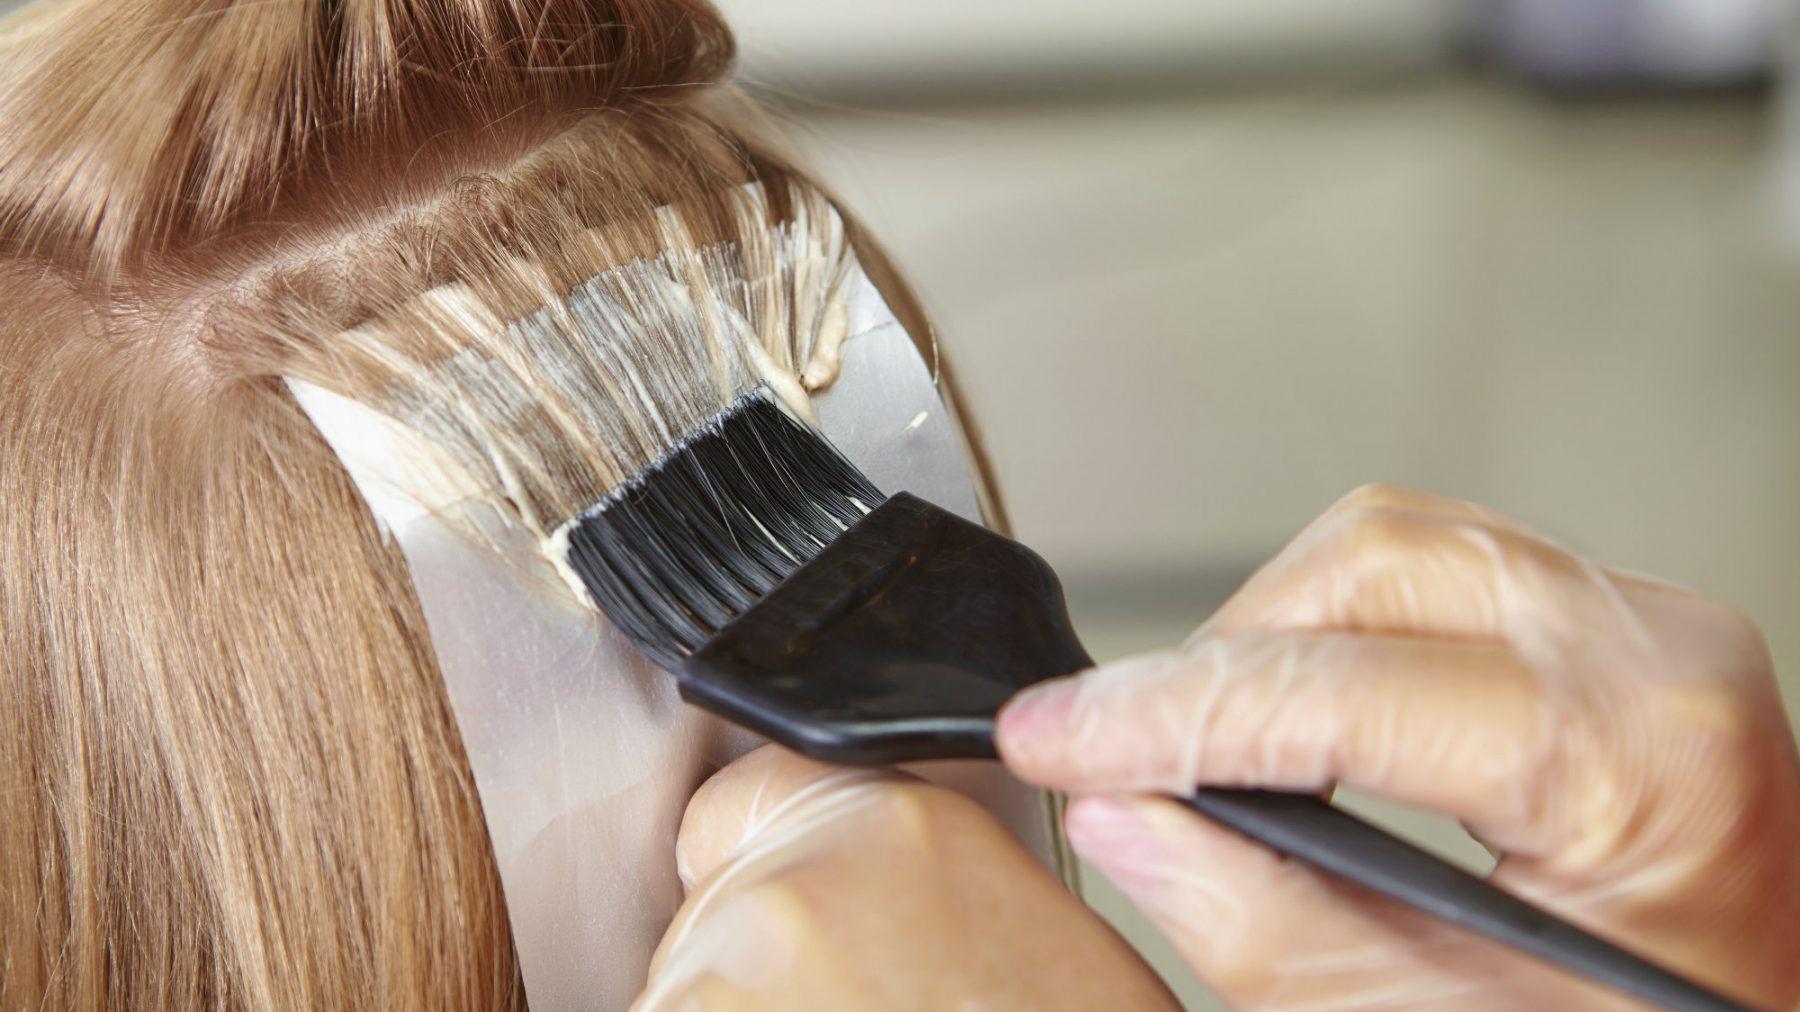 Use foil DIY hair dye